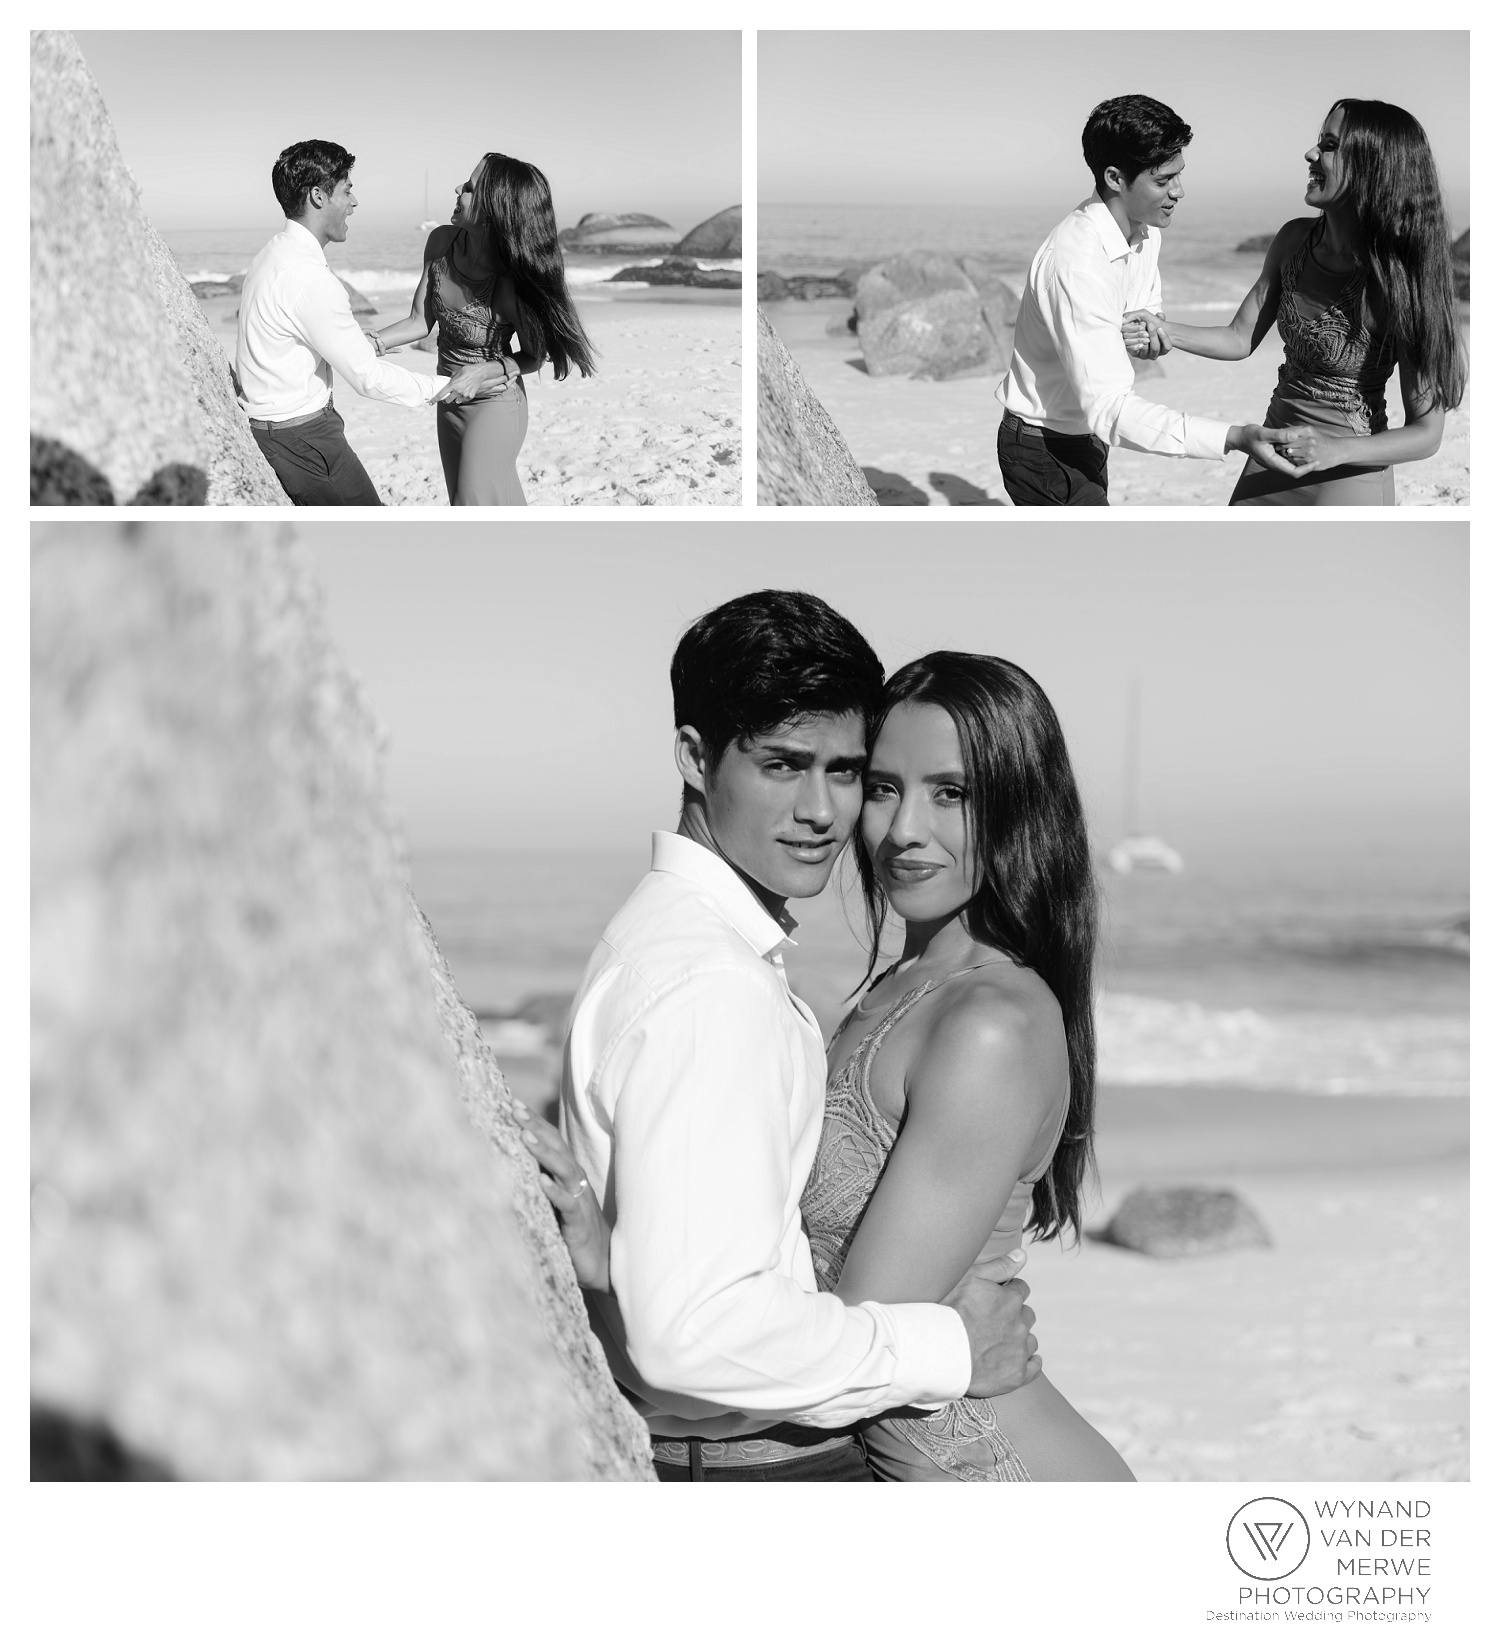 WvdM_engagementshoot_engaged_couple_prewedding_llandudno_cliftonbeach_beach_formal_southafrica_weddingphotographer_greernicolas-105.jpg